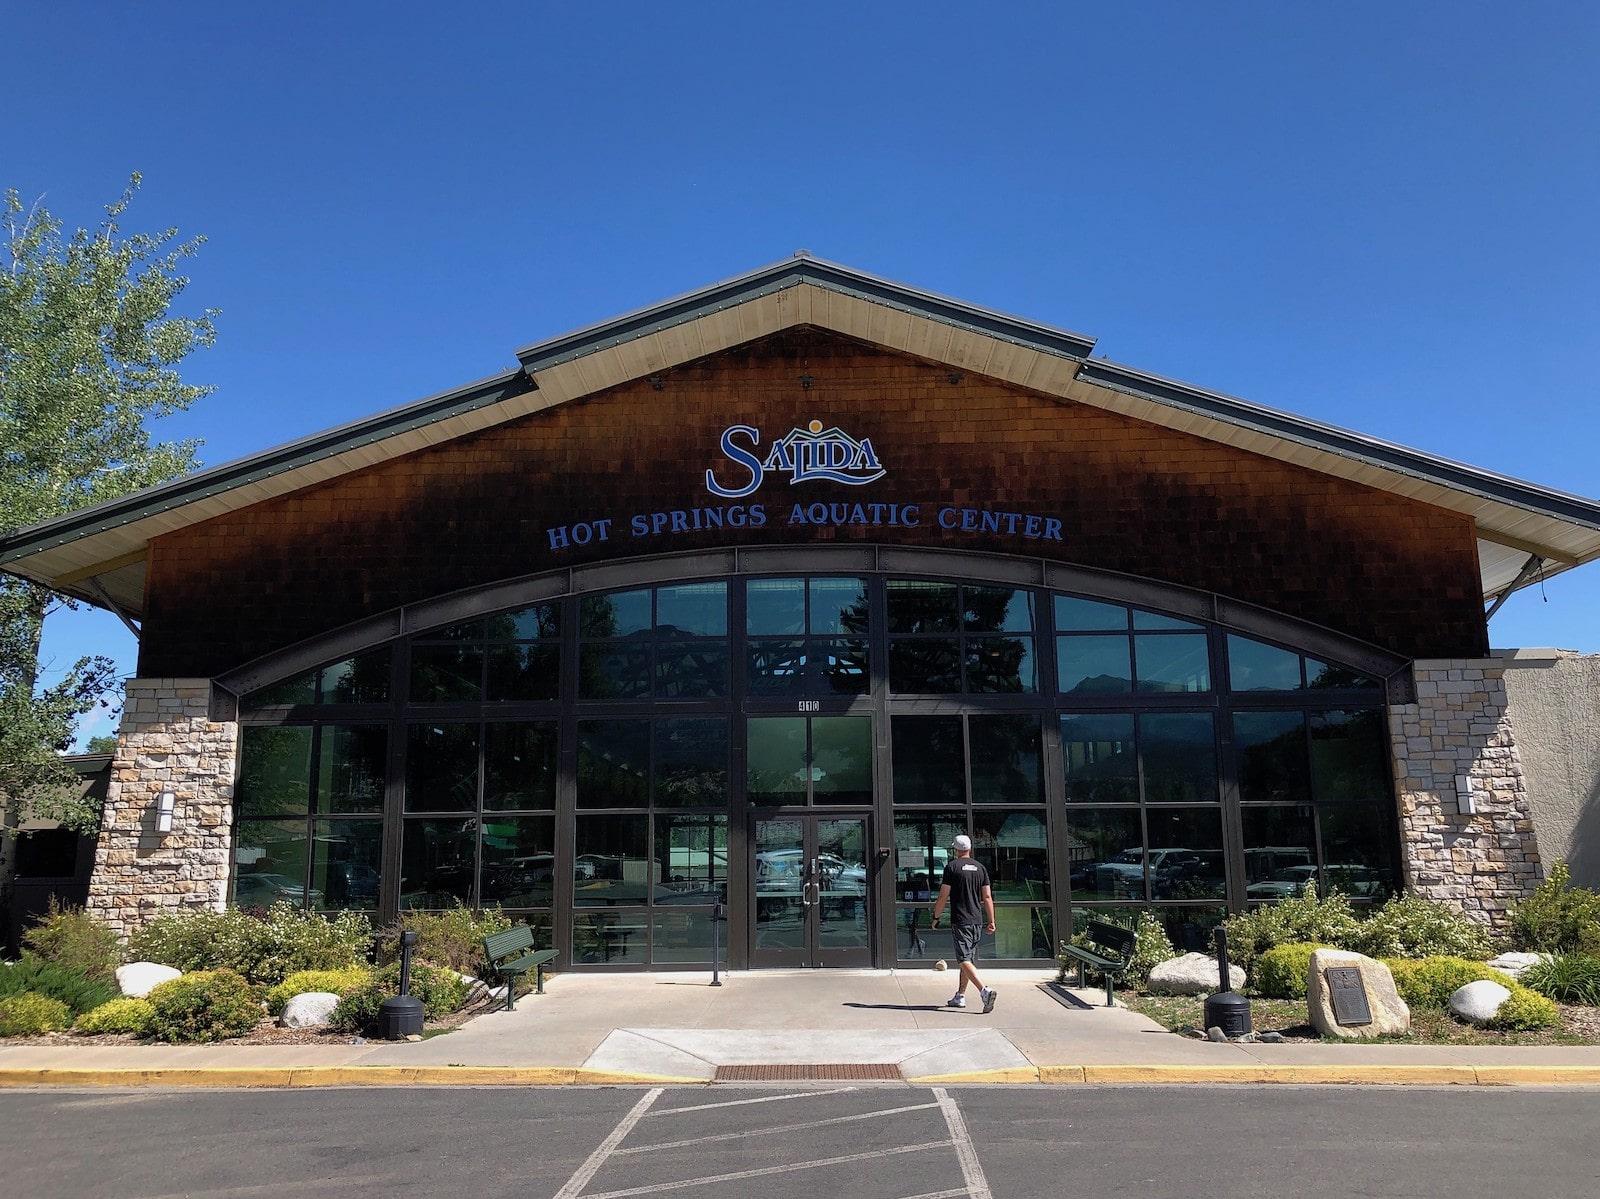 Salida Hot Springs Aquatic Center, Co